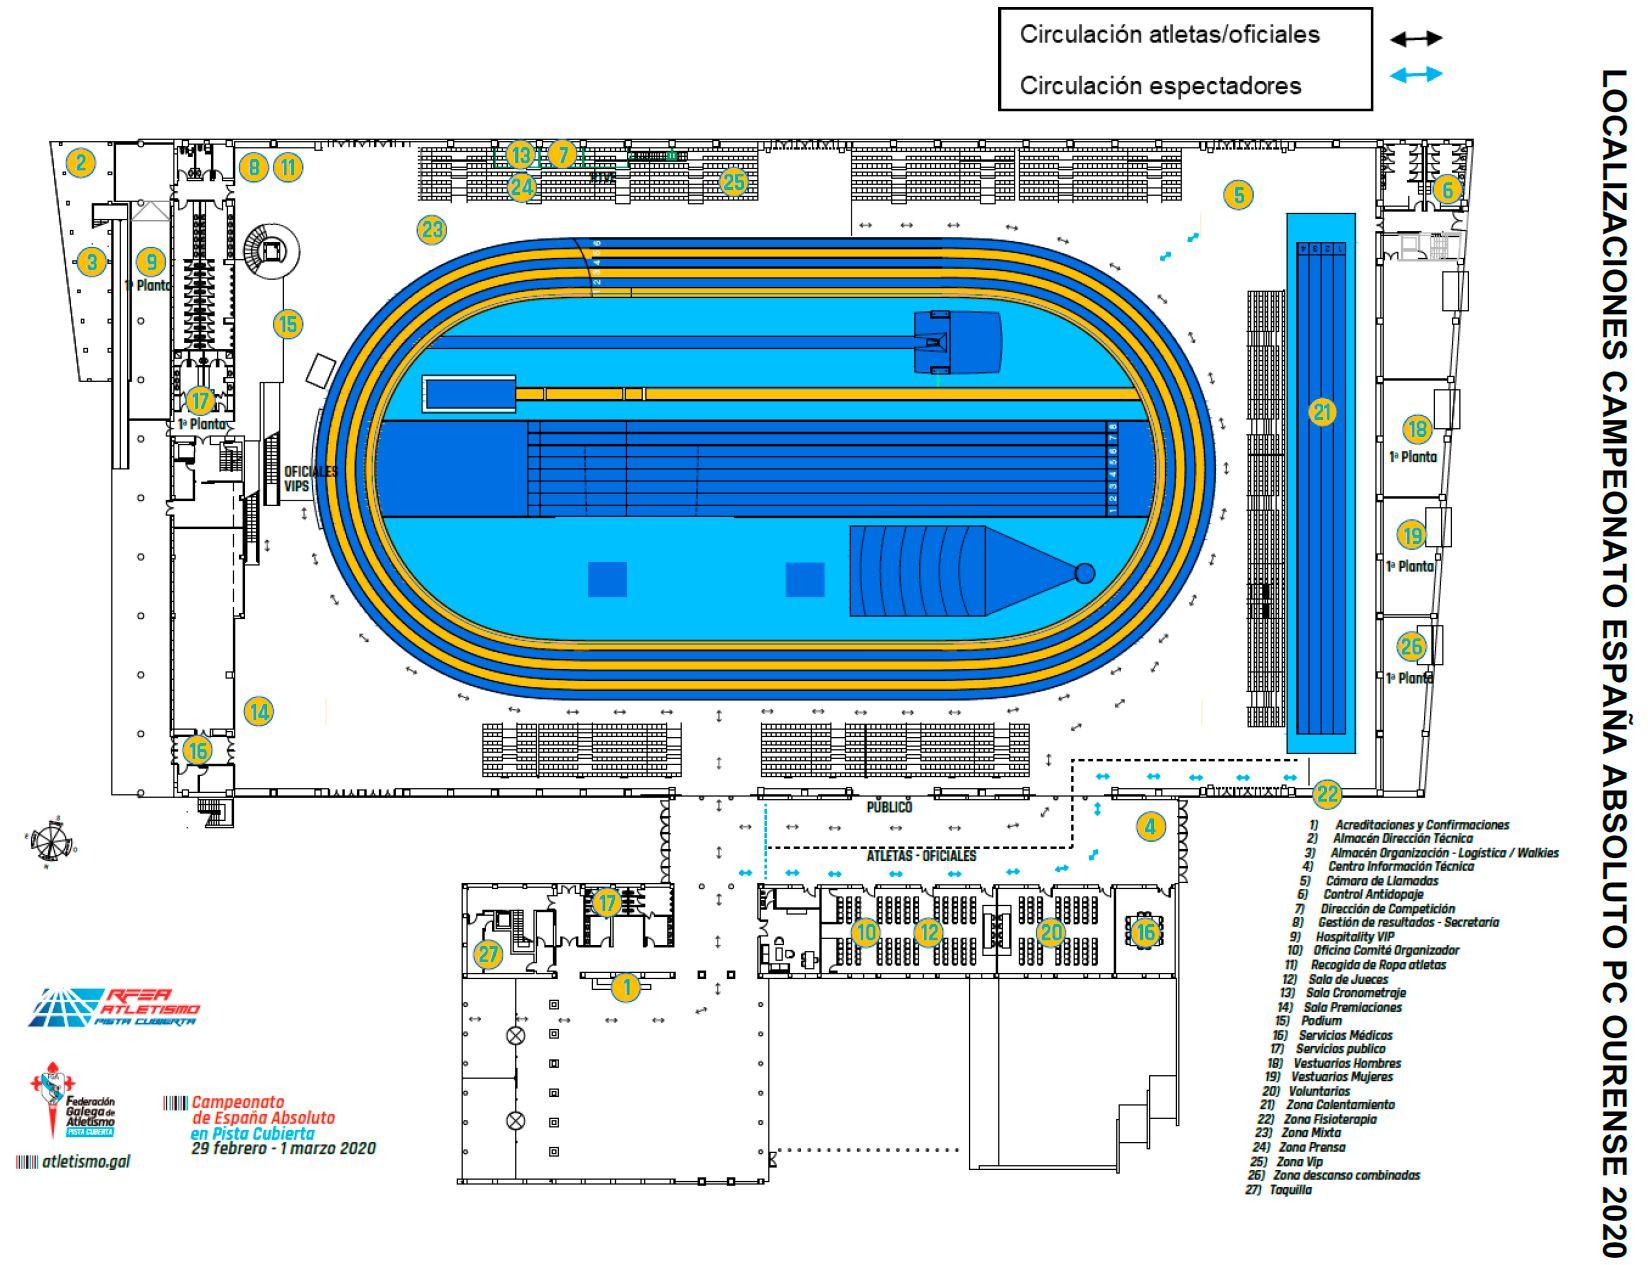 plano campeonato absoluto ourense 2020 expourense